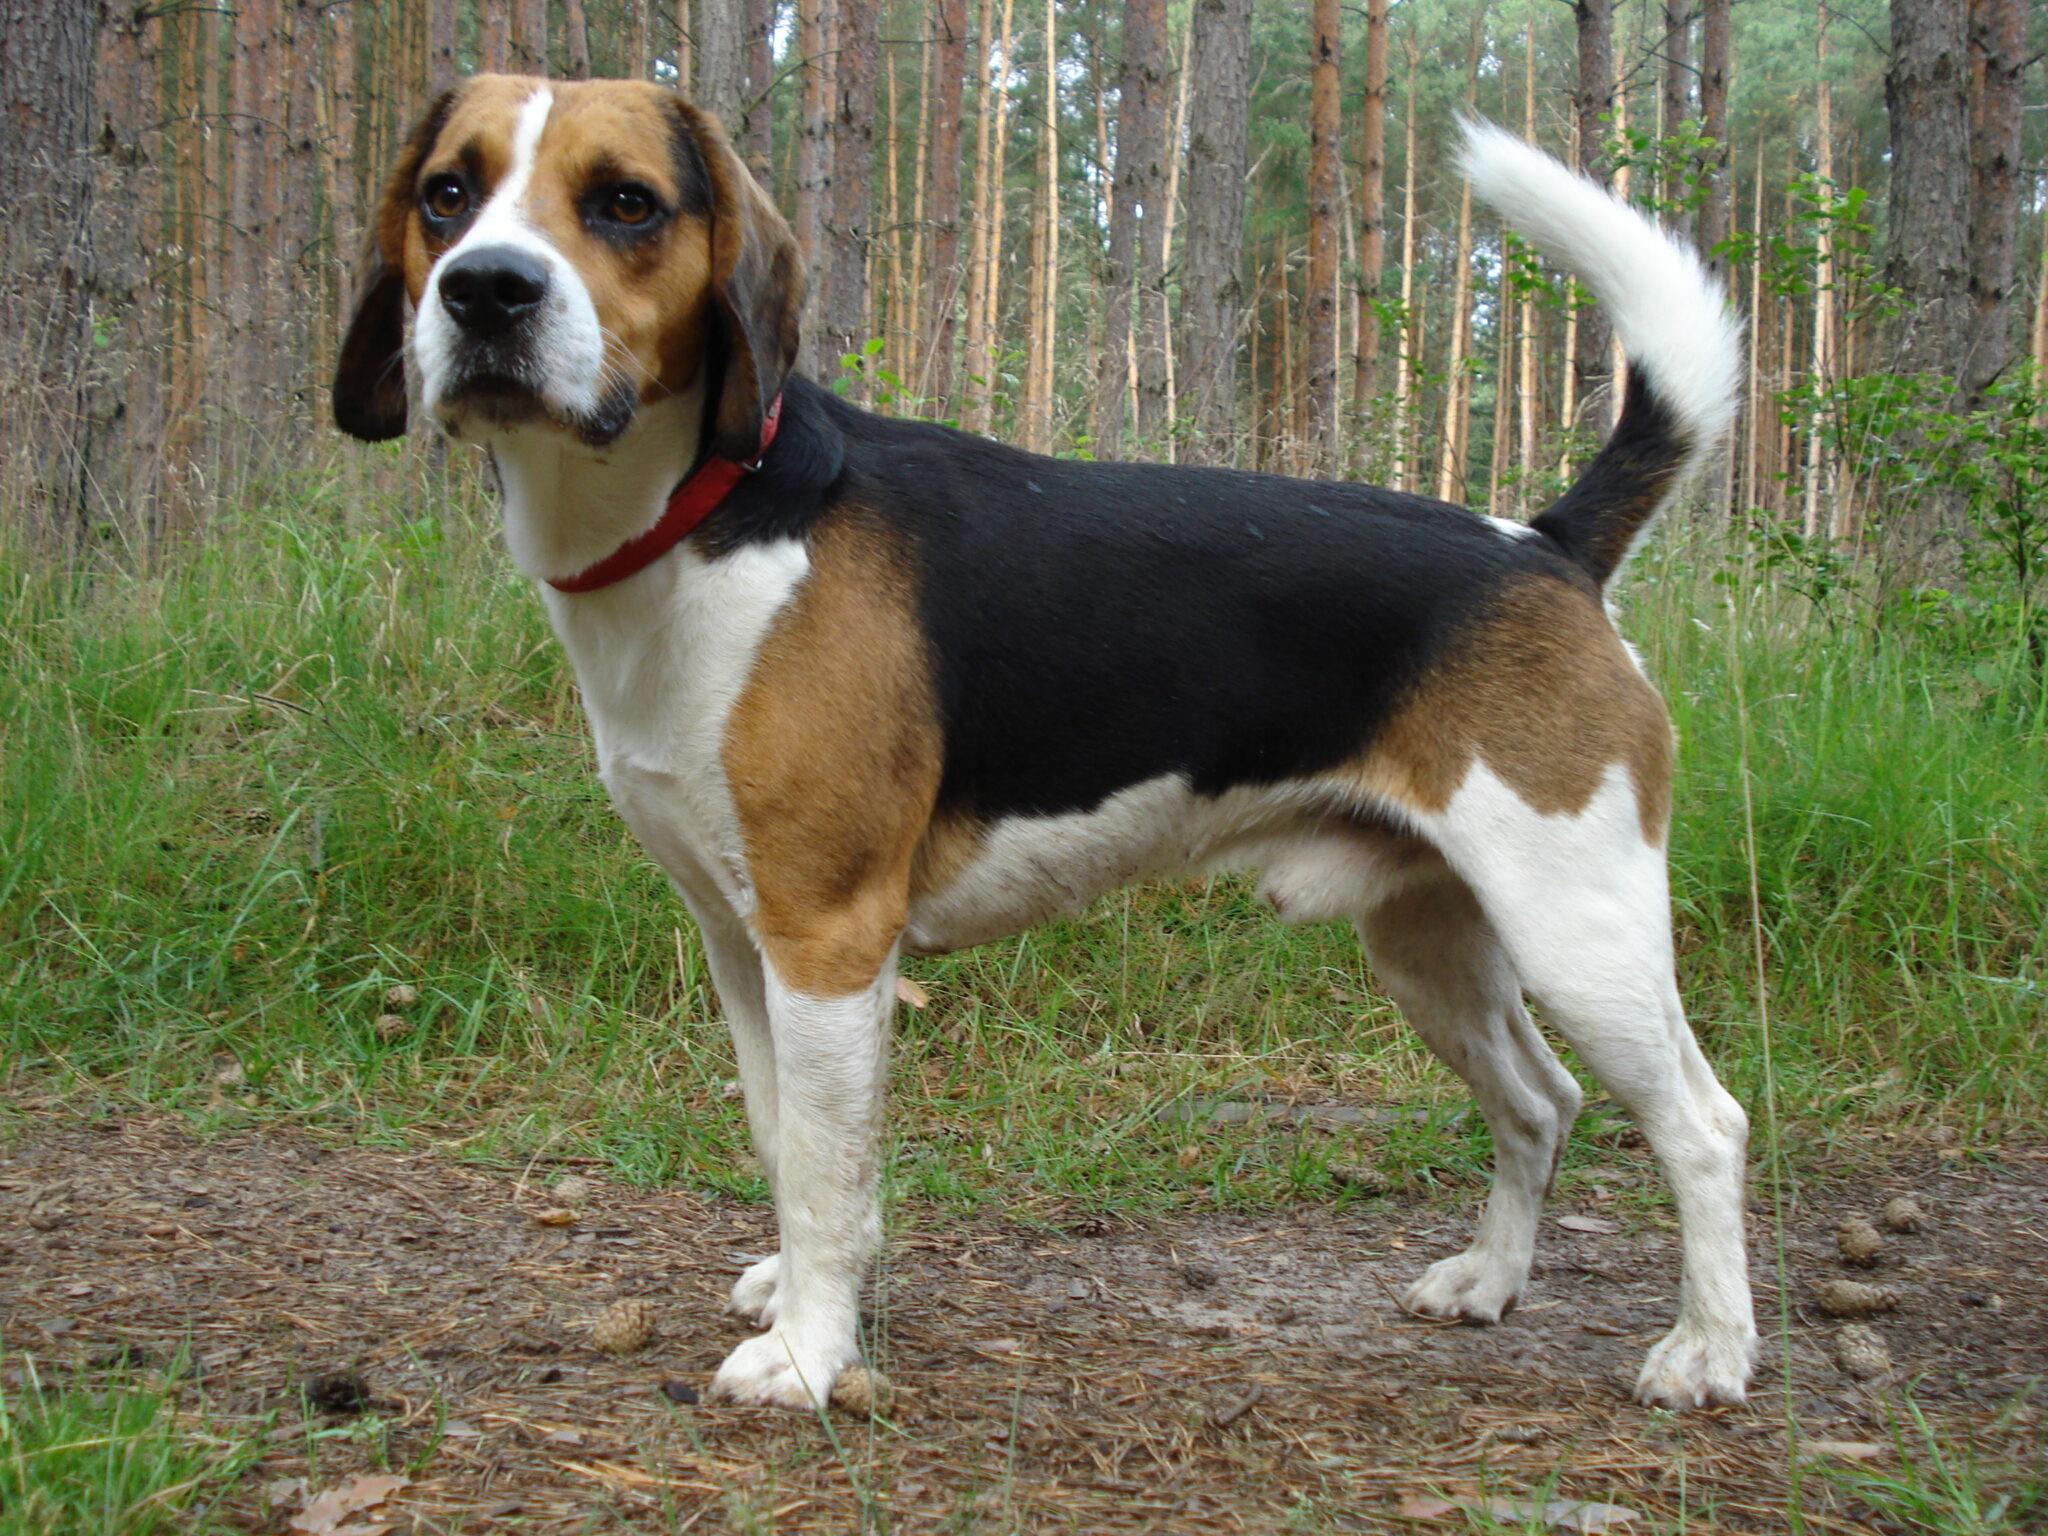 esemplare di cane Beagle-Harrier